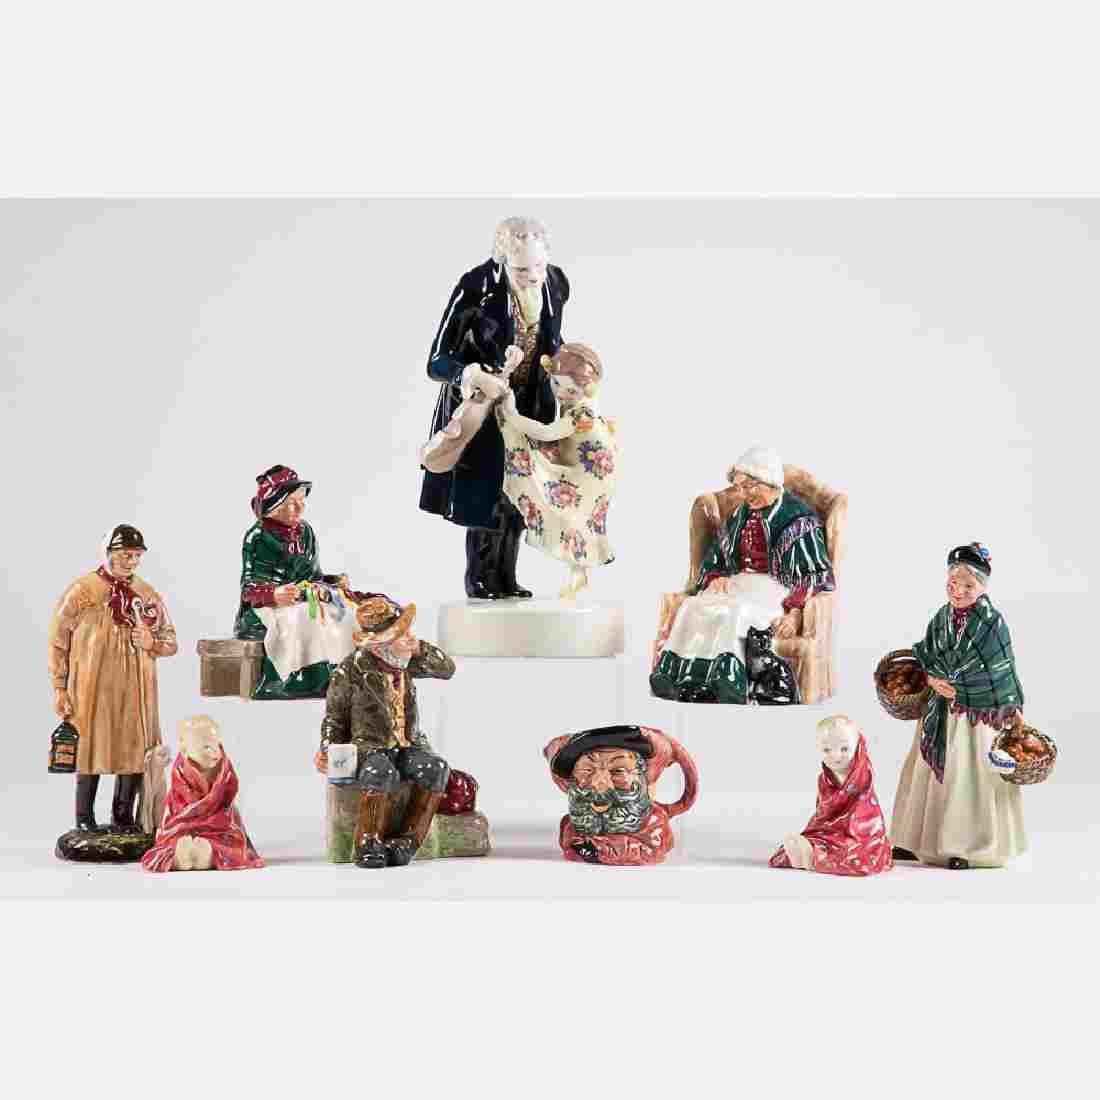 A Miscellaneous Collection of Eight Royal Doulton